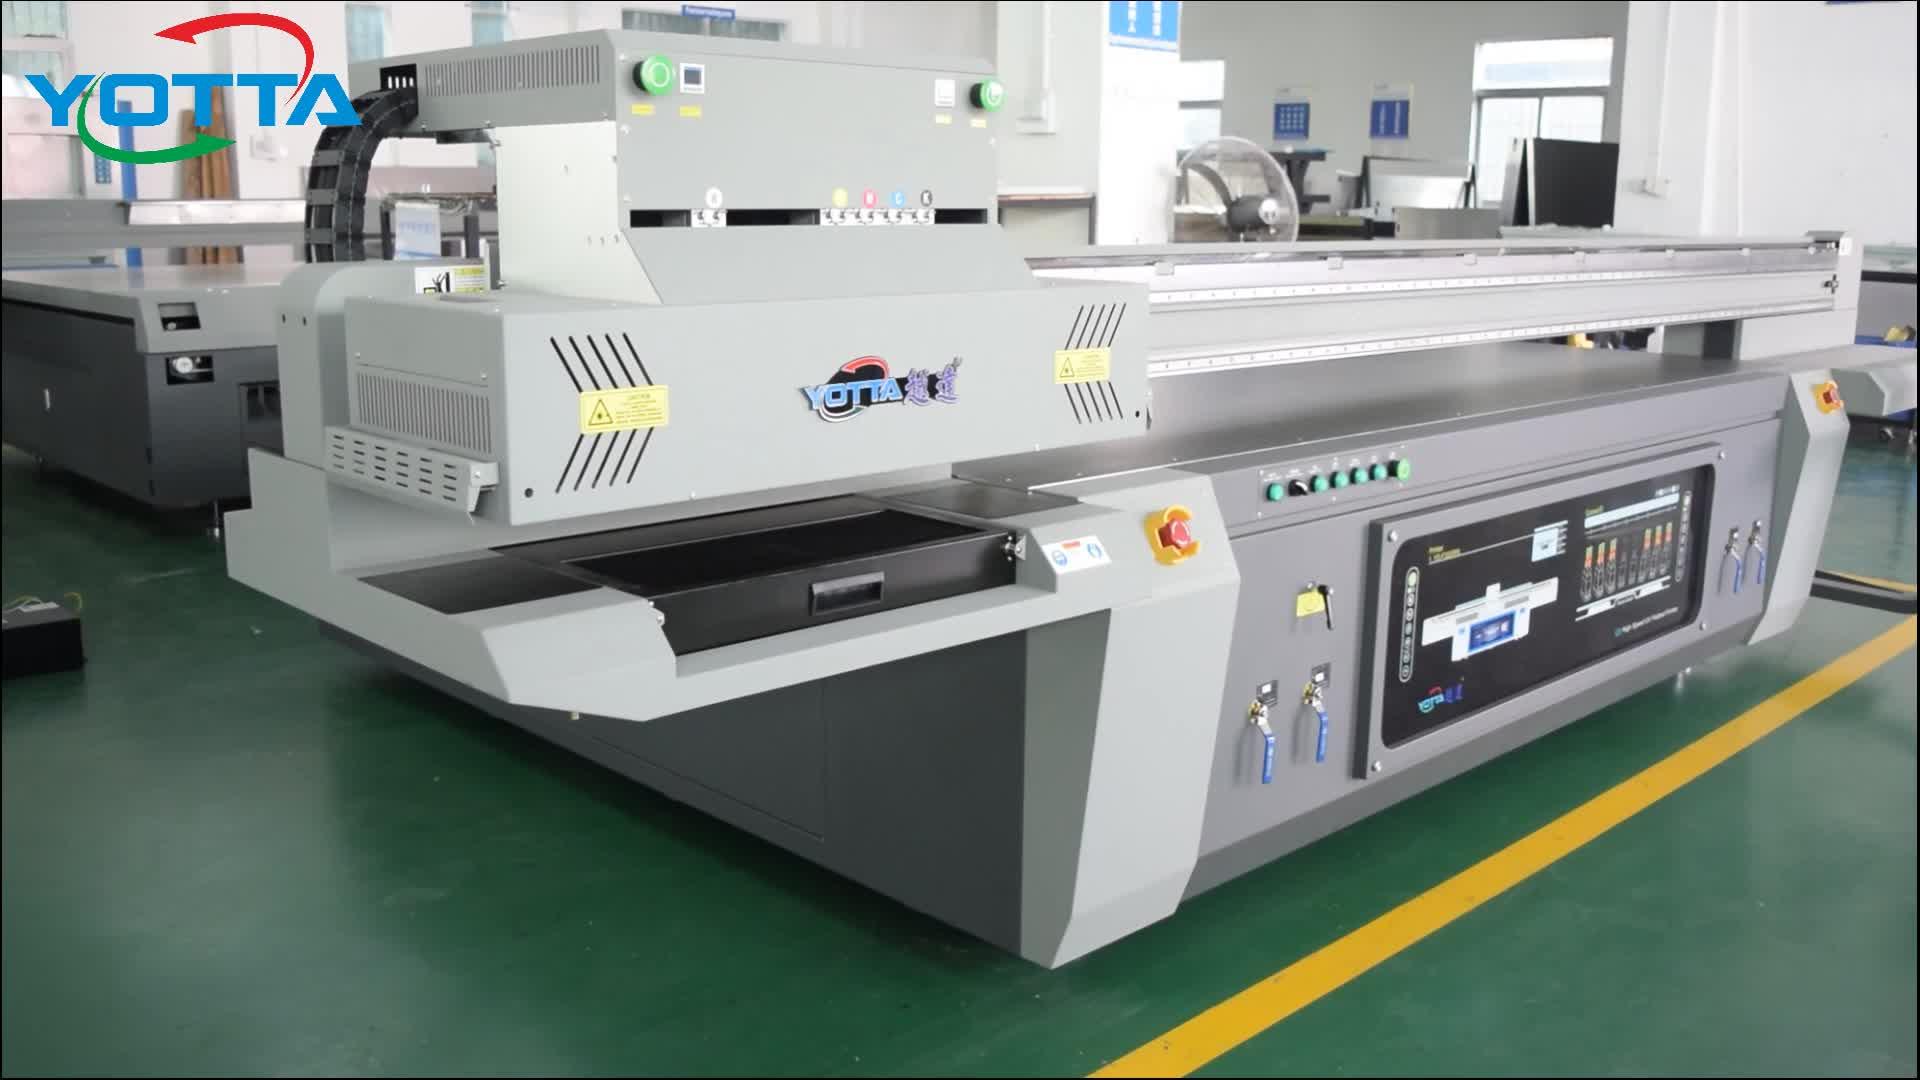 Yotta UV Inkjet Led Printer/Grootformaat UV Flatbed Printer